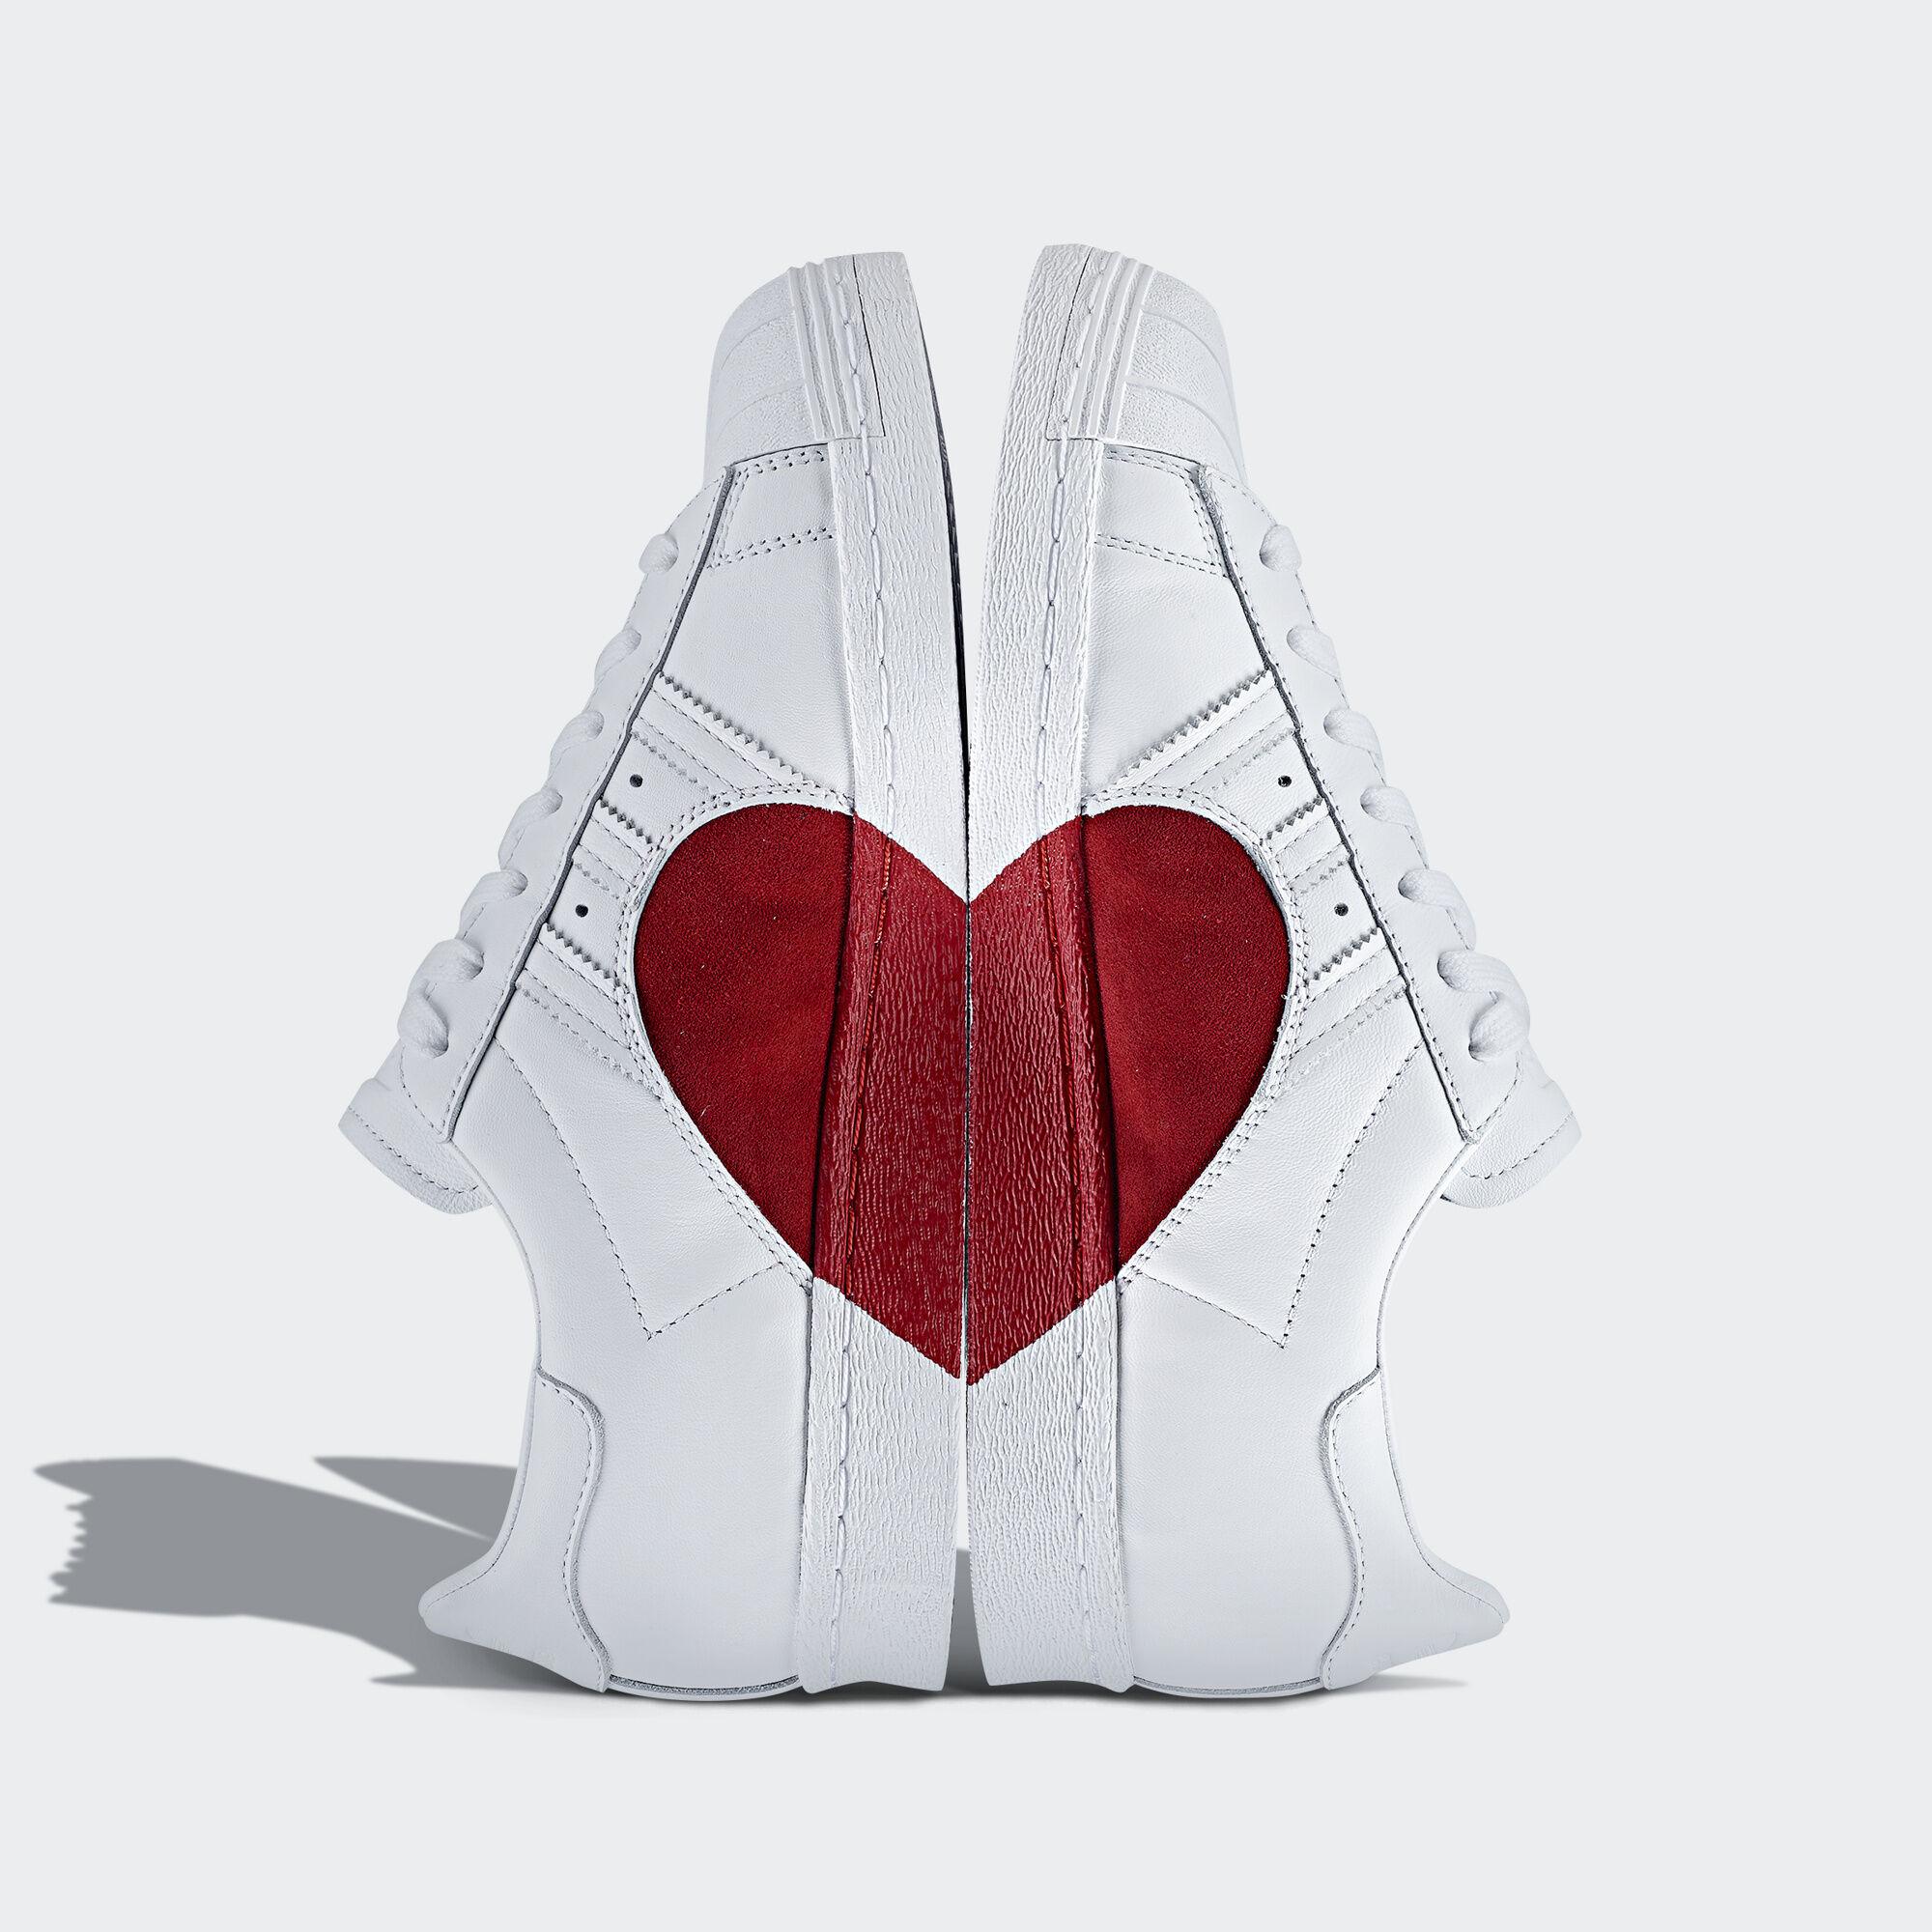 adidas - Sapatos Superstar 80s Half Heart Ftwr White/Ftwr White/Scarlet CQ3009